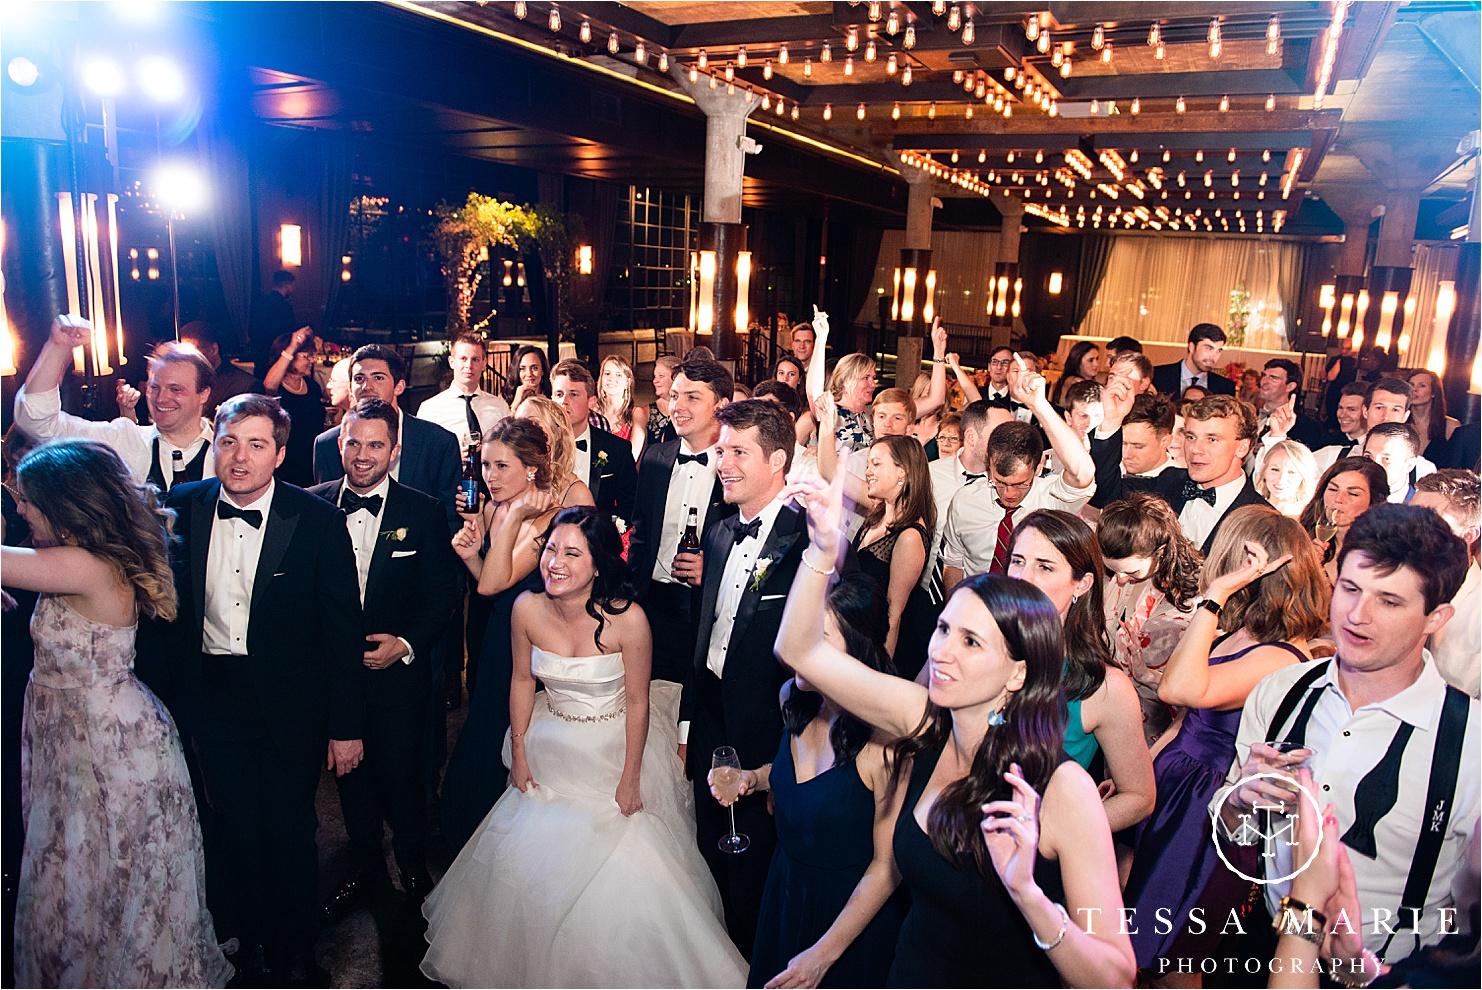 Tessa_marie_weddings_houston_wedding_photographer_The_astorian_0181.jpg